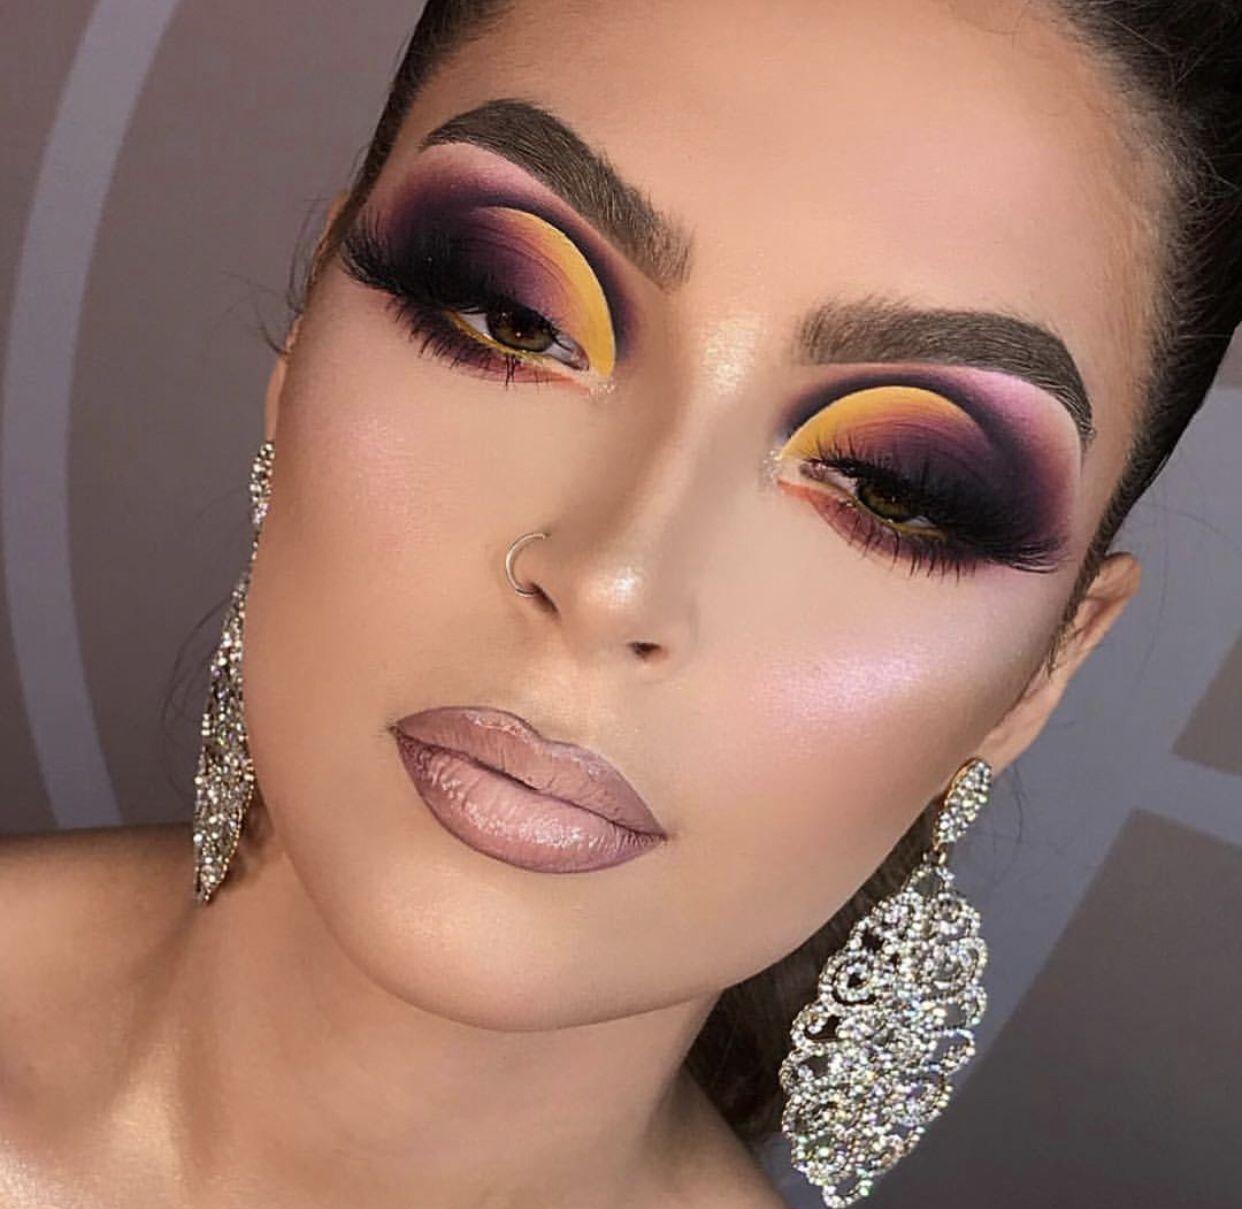 Useful Makeup Tips To Look Beautiful in 12  Mac makeup